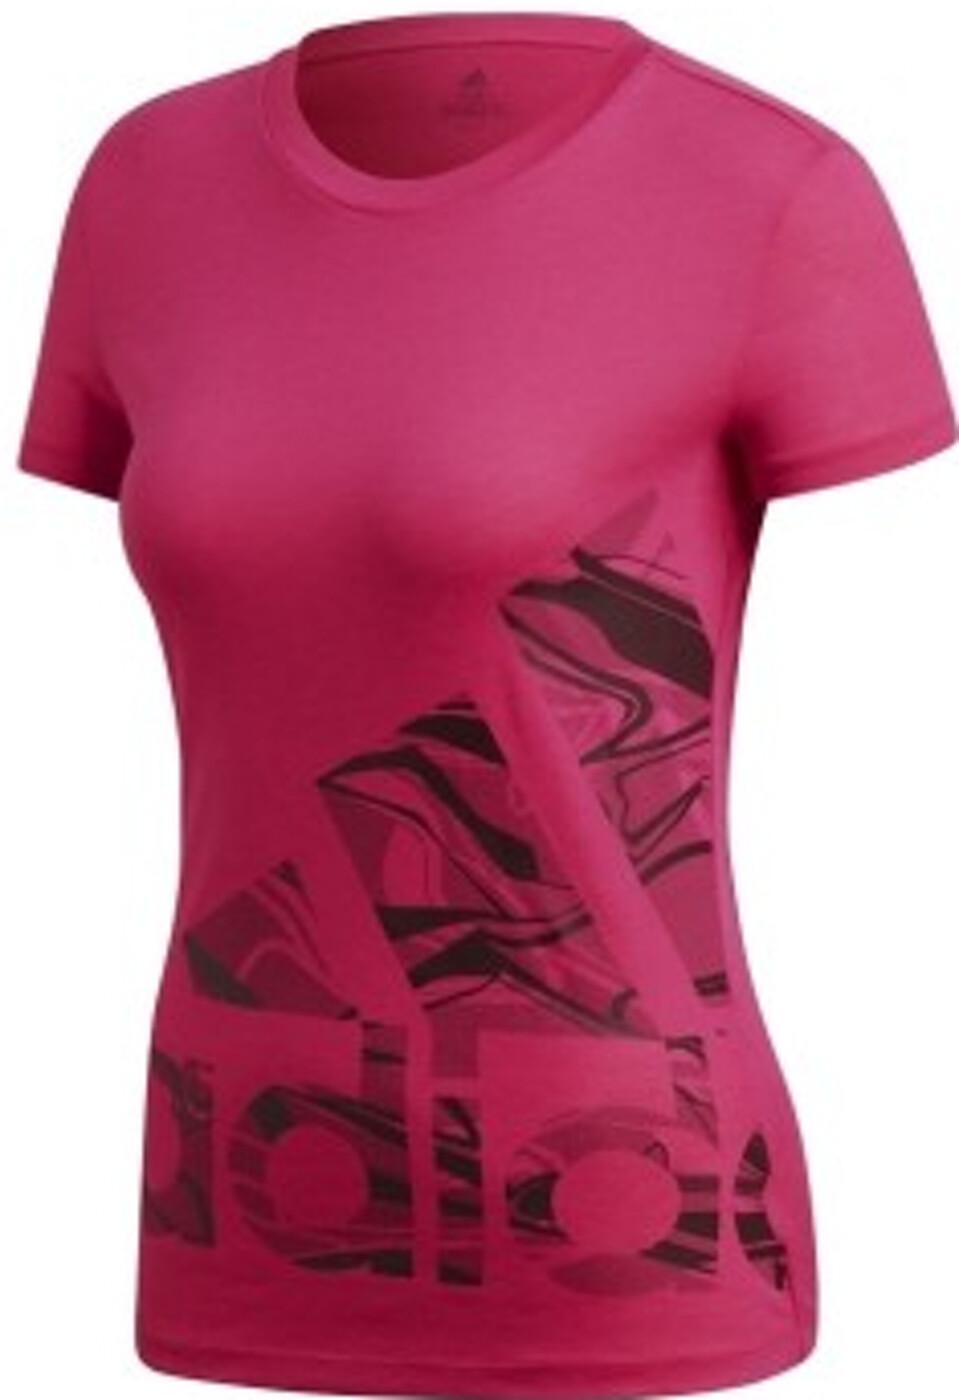 adidas Damen Adi Logo Tee T Shirt rosa NEU Polos & Shirts